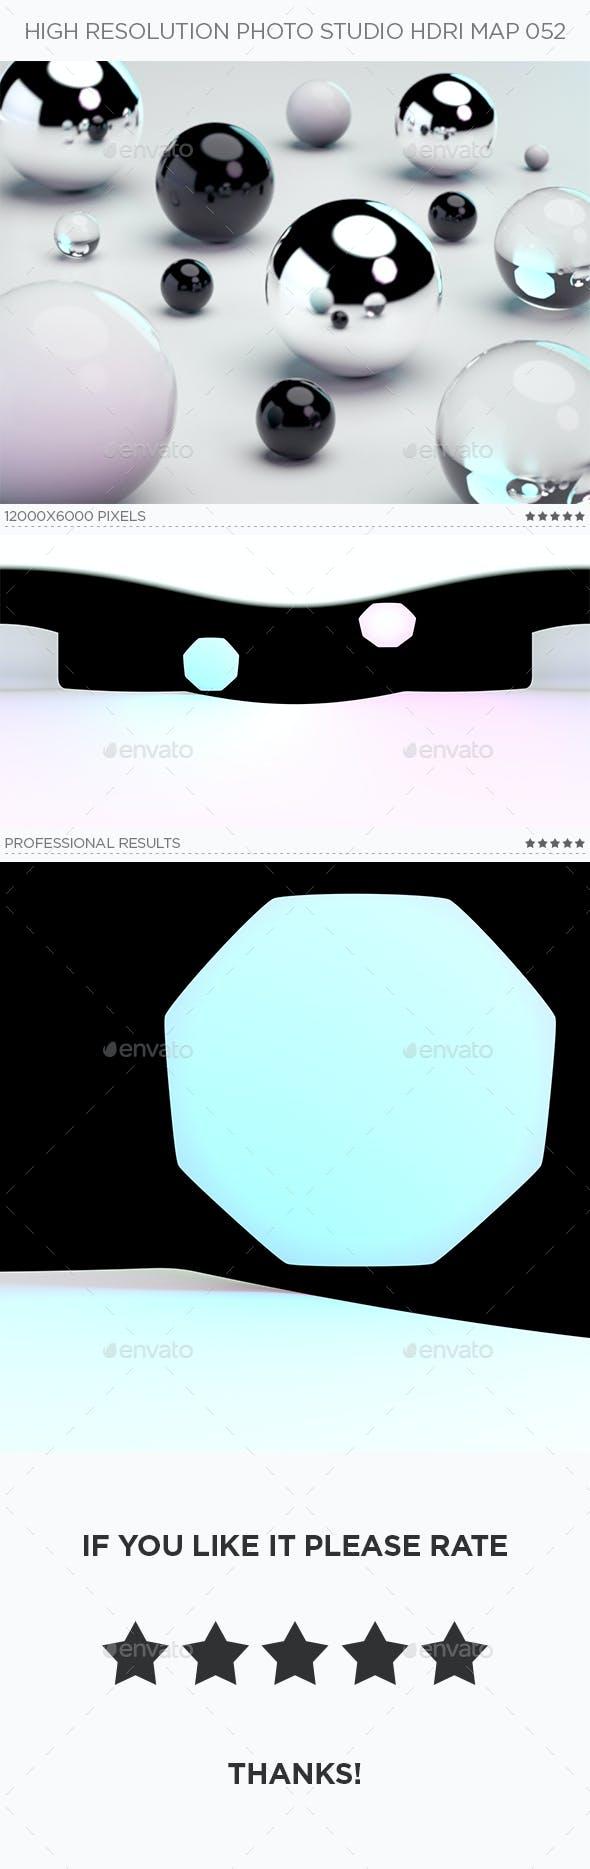 High Resolution Photo Studio HDRi Map 052 - 3DOcean Item for Sale